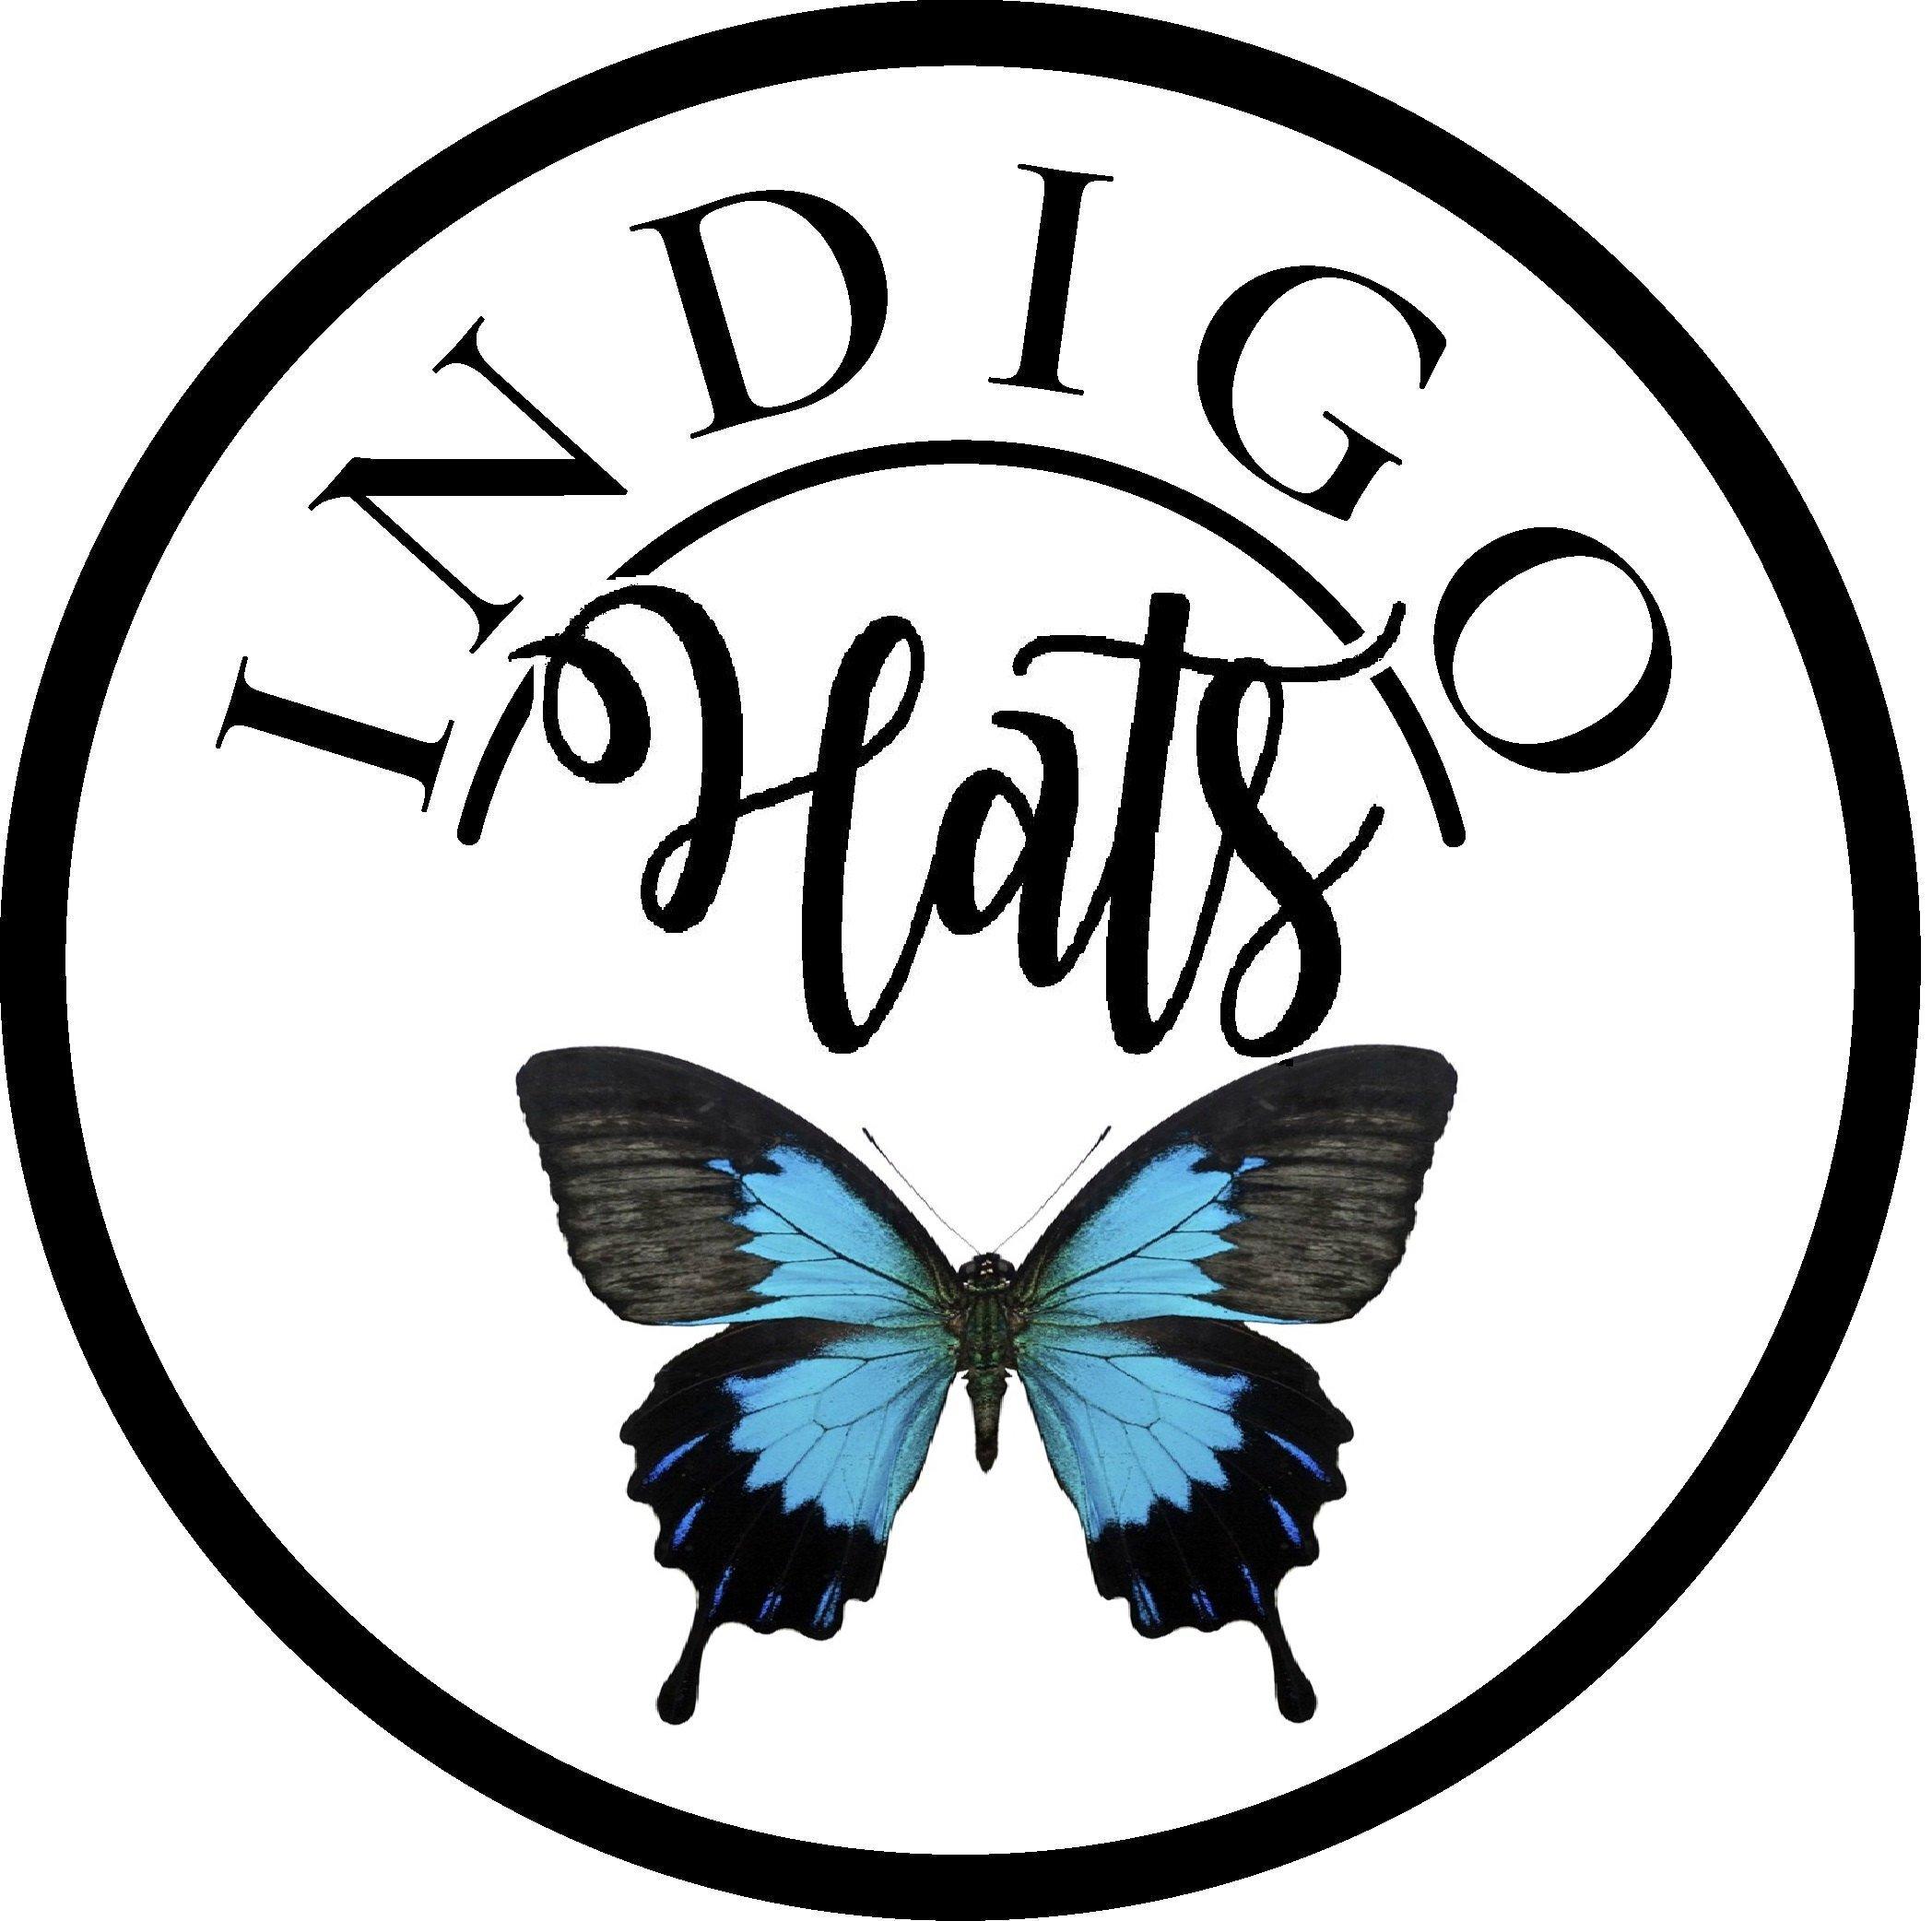 Indigo Hats